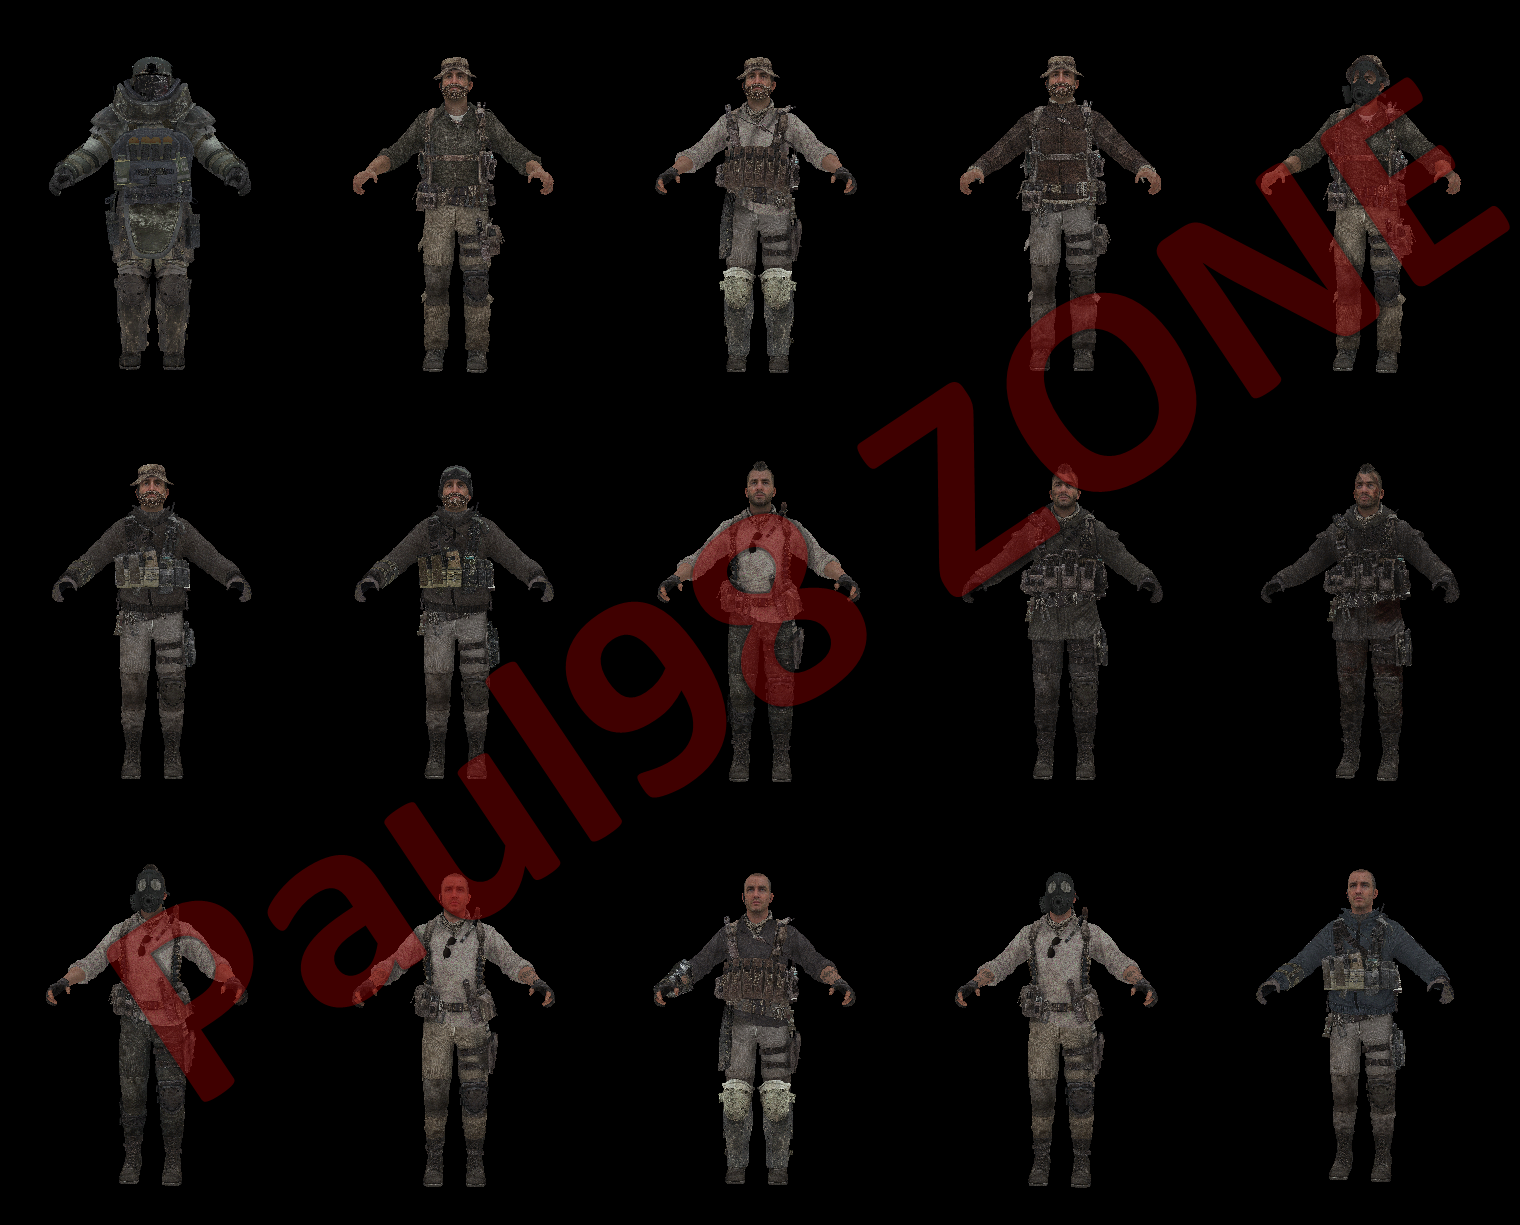 Task Force 141 Hd Wallpaper hd wallon 1520x1225